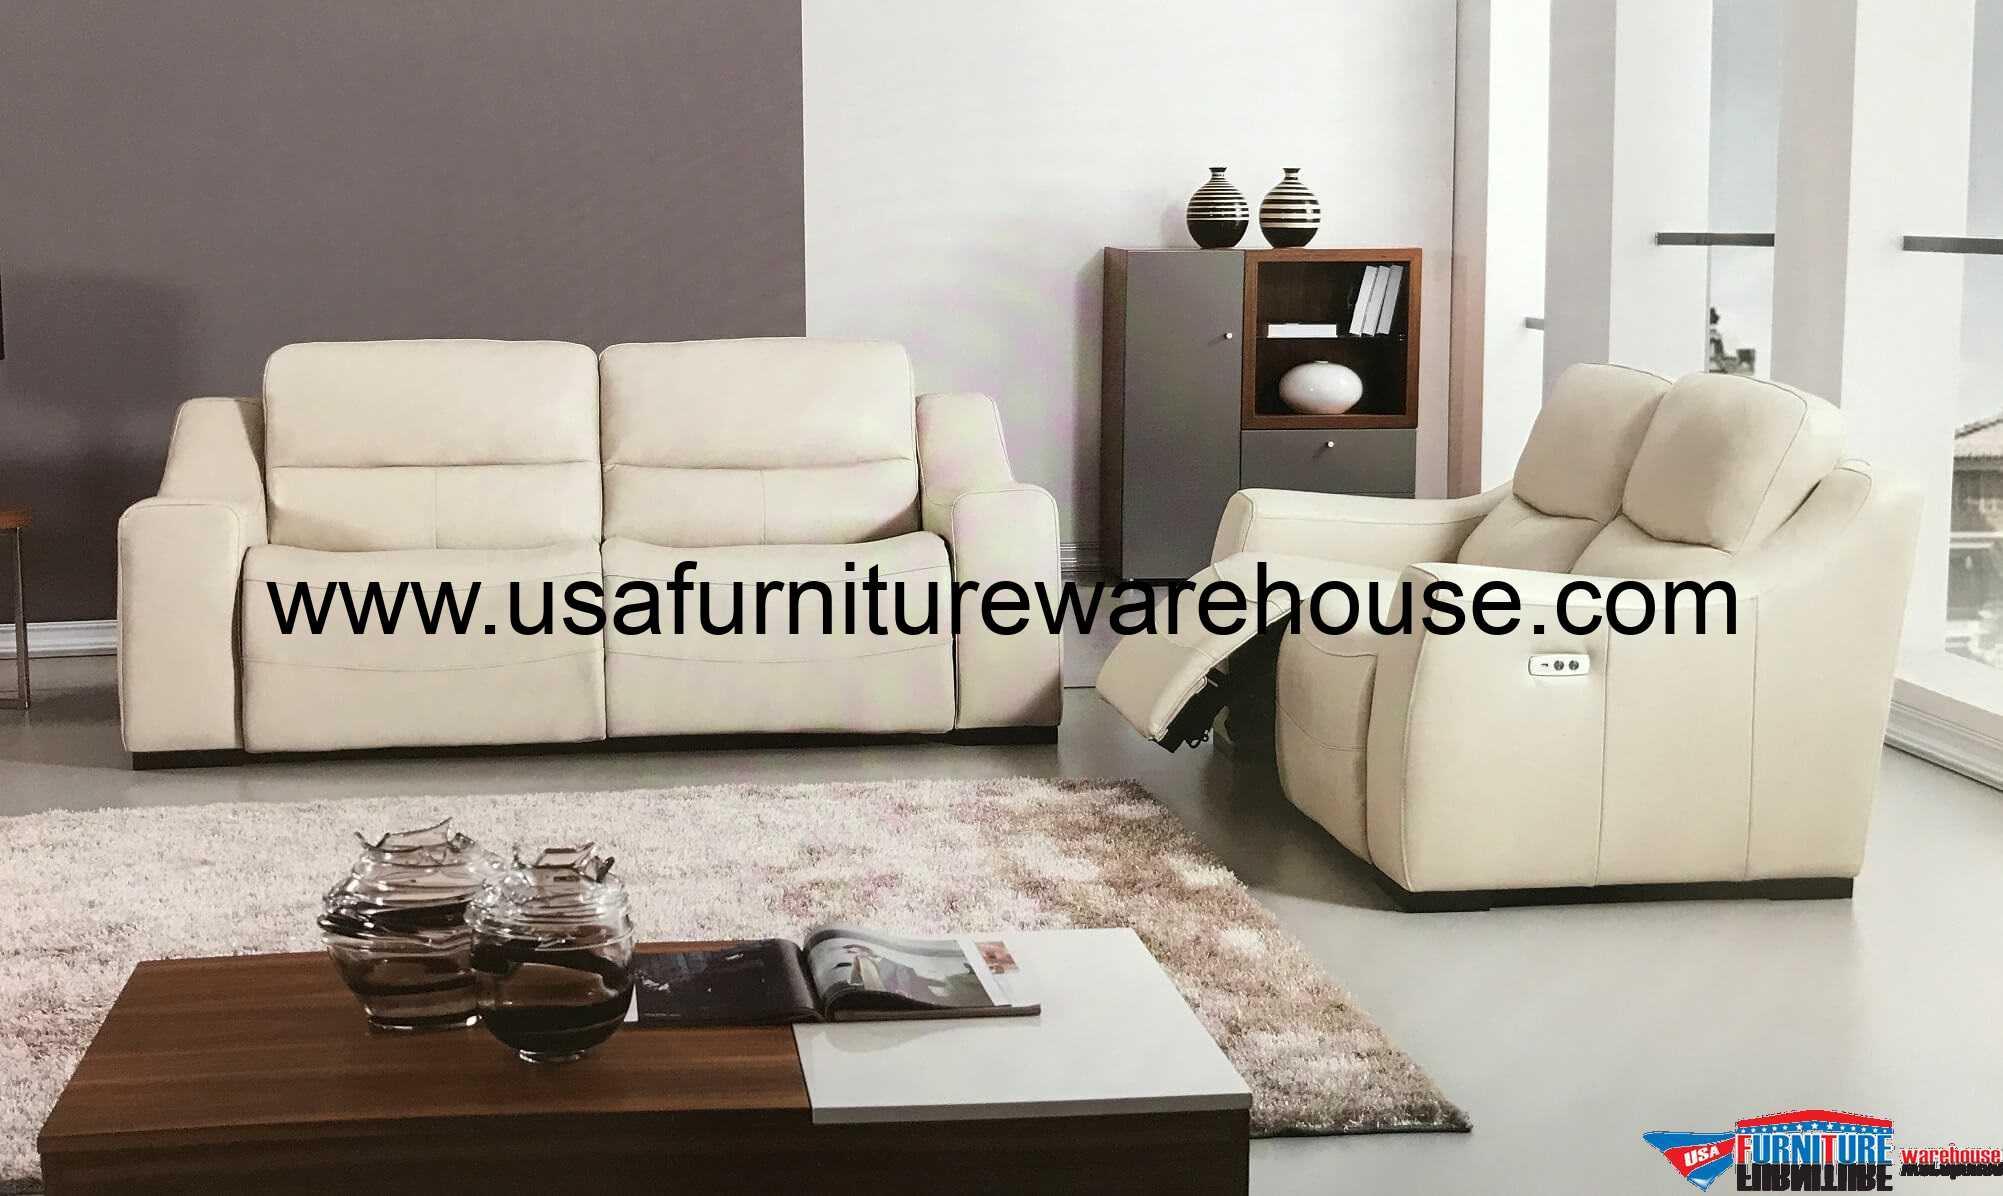 2 Piece Avana Full Italian Leather Power Recliner Sofa Set